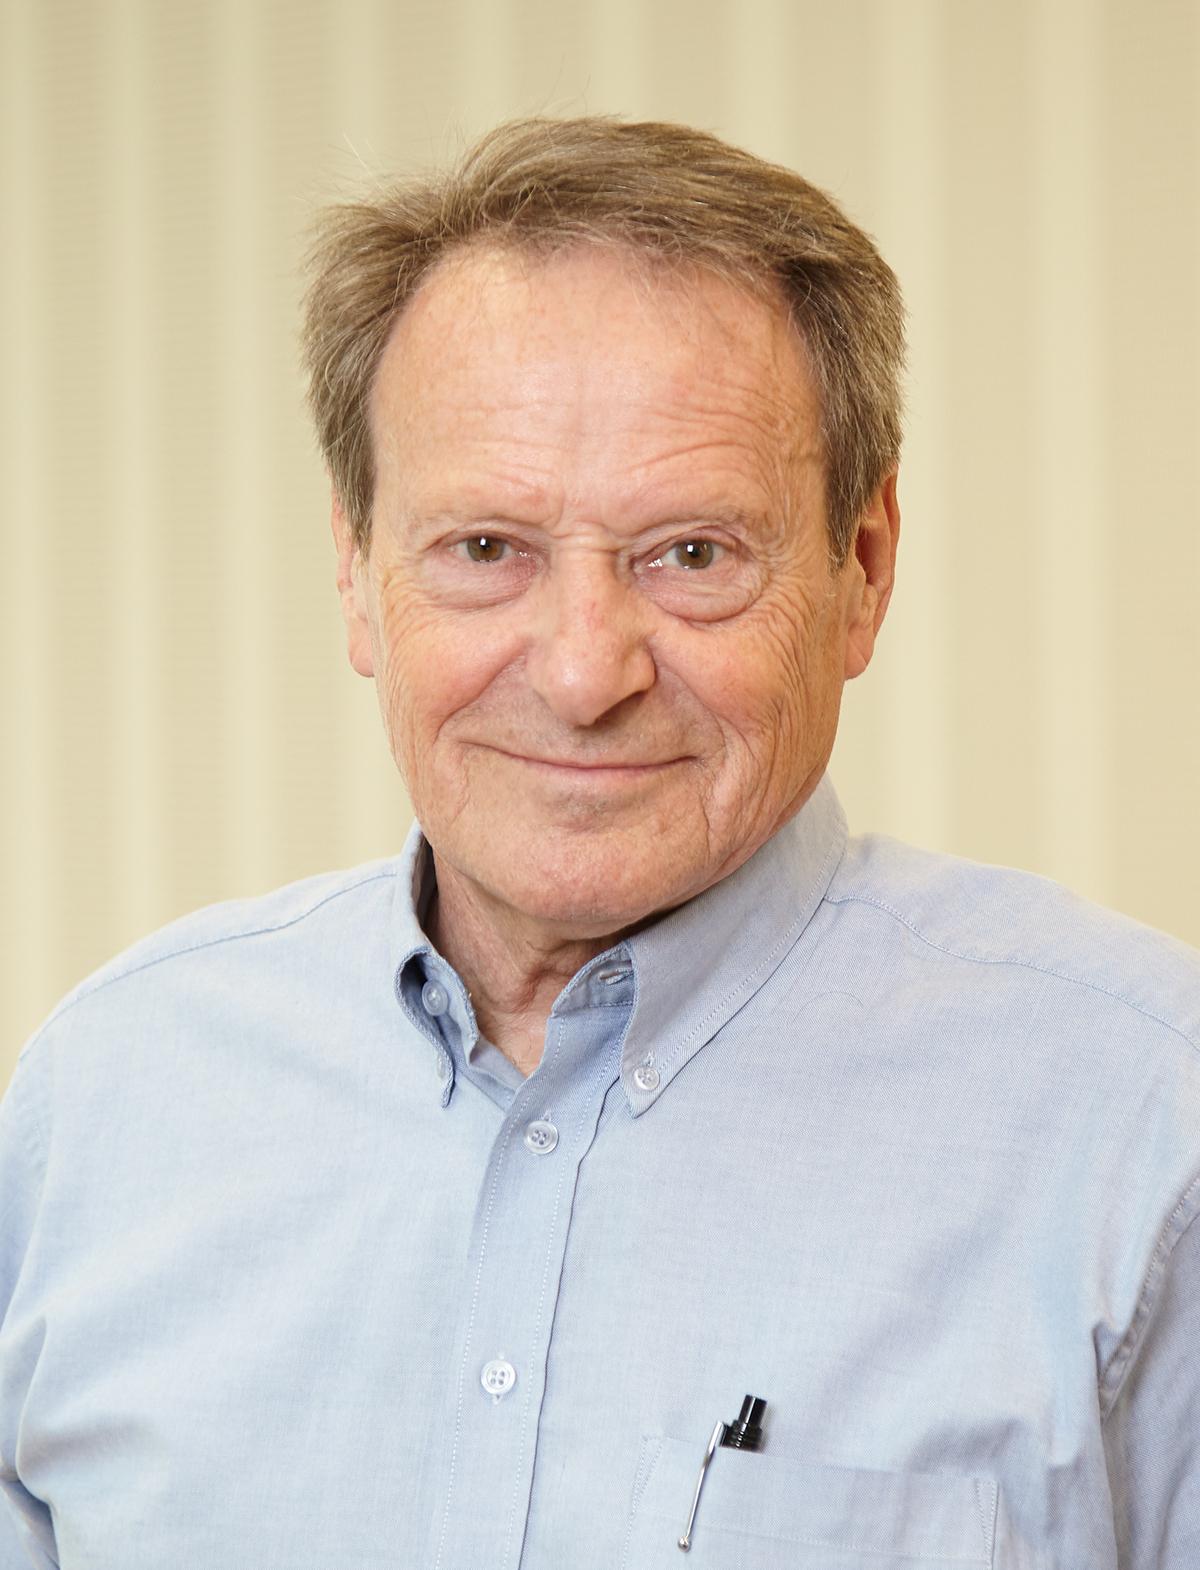 Dansk ældreråd Flemming Tejmers